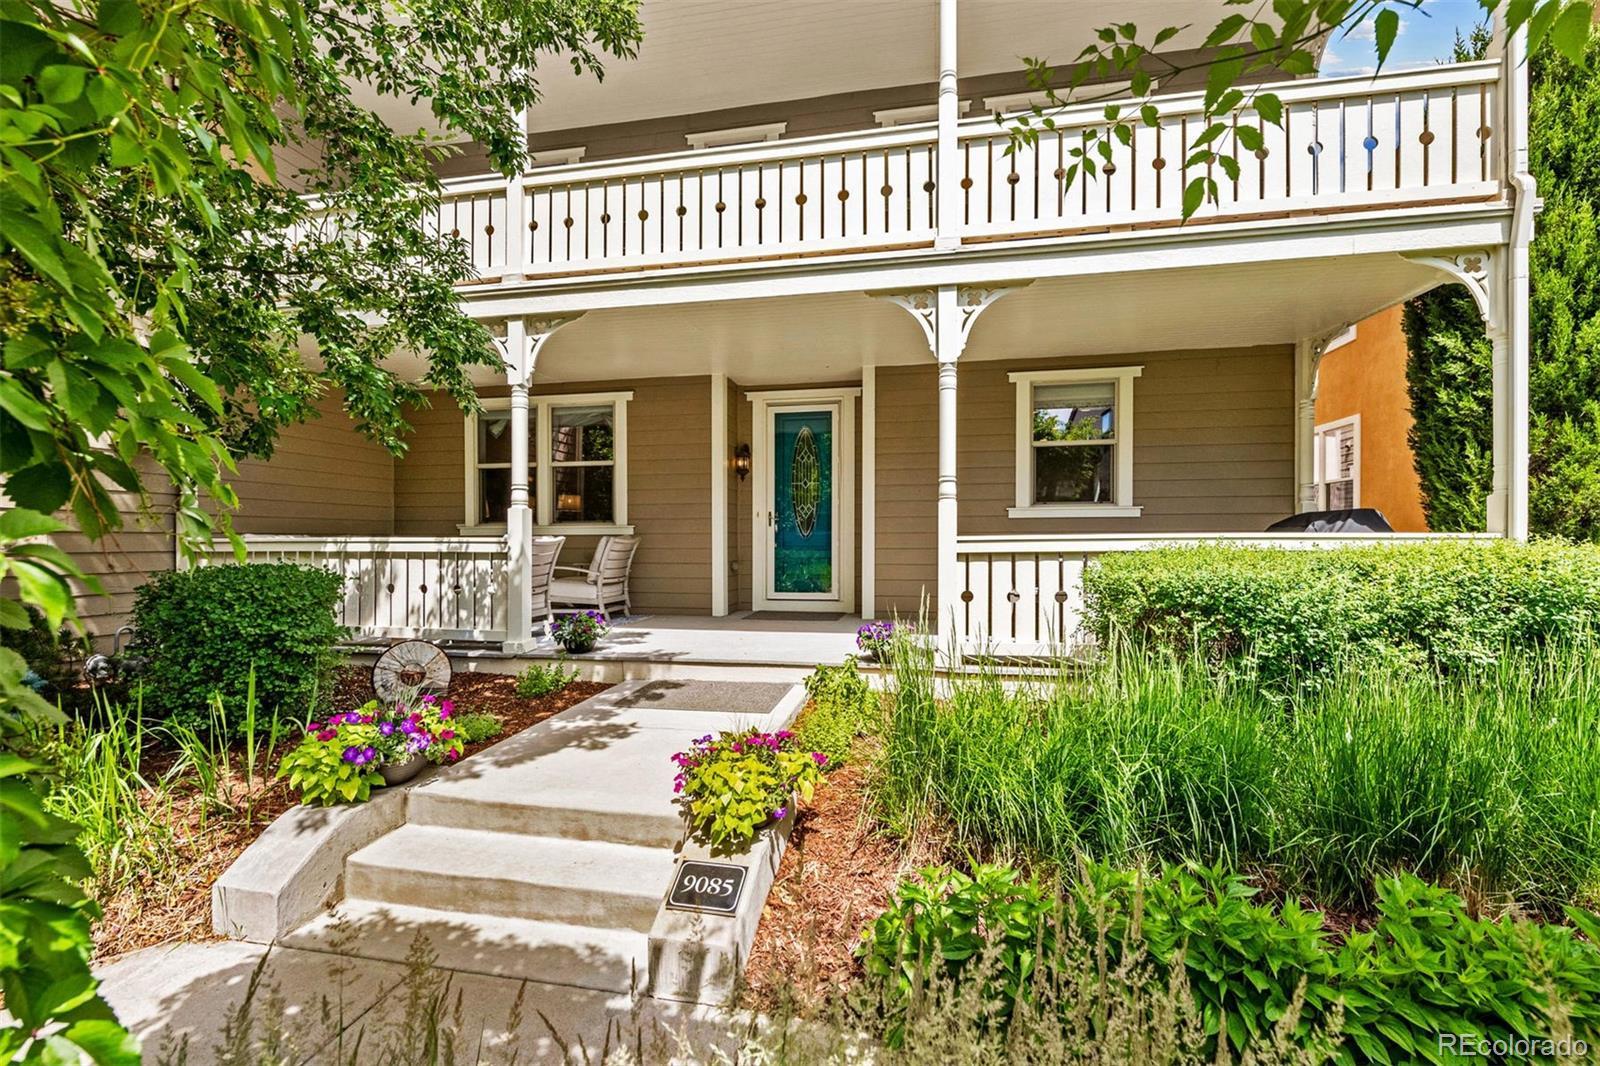 9085 E 29th Place Property Photo - Denver, CO real estate listing